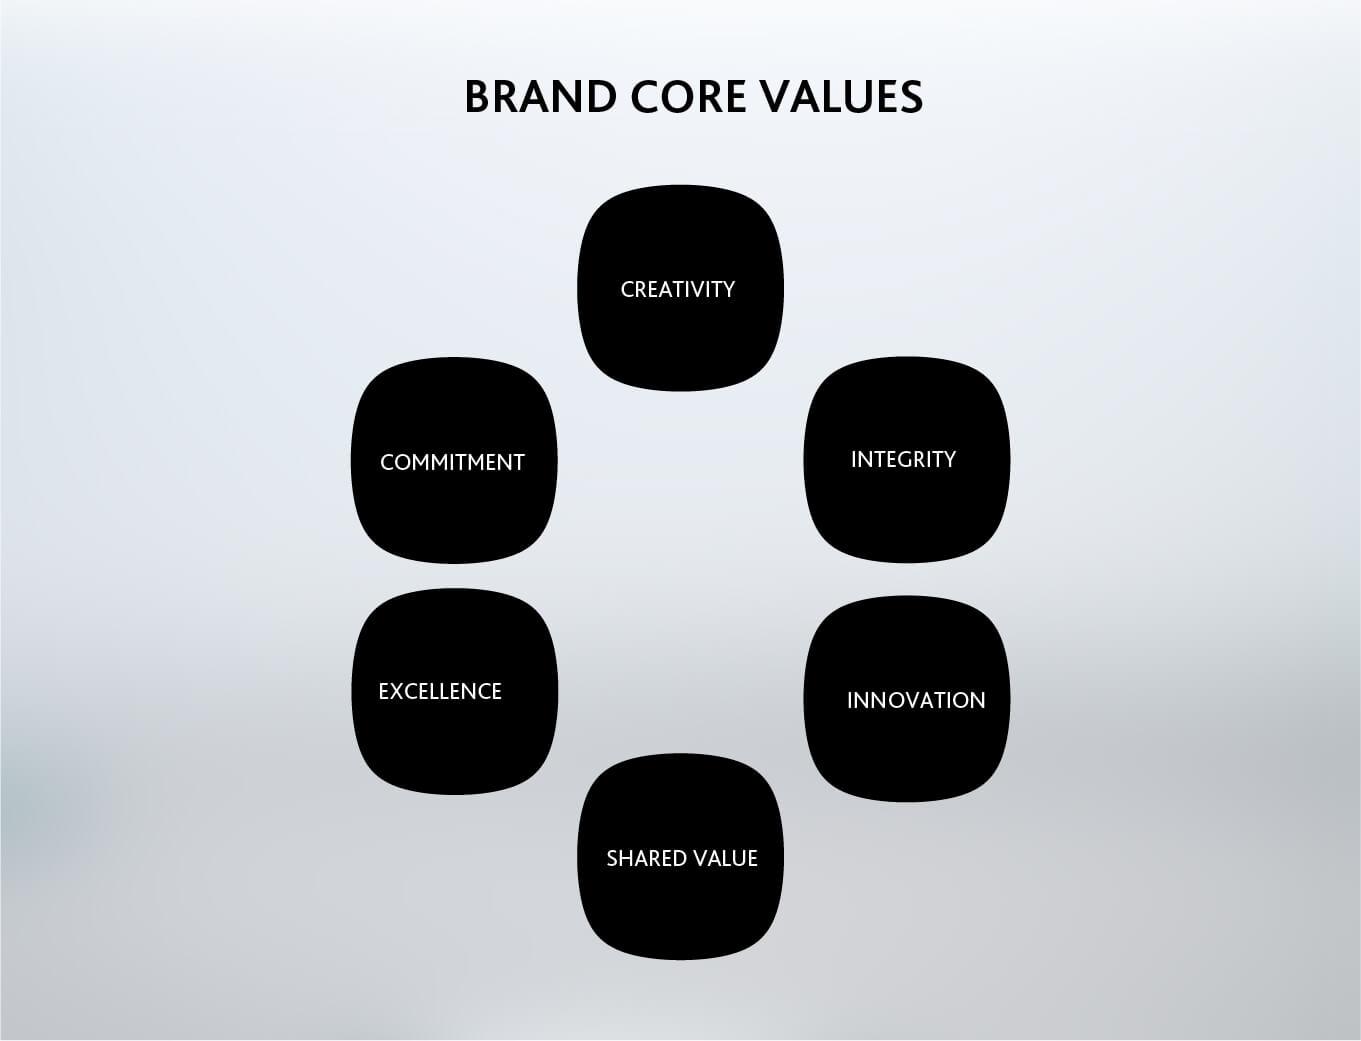 Zens tableware brand core value chart